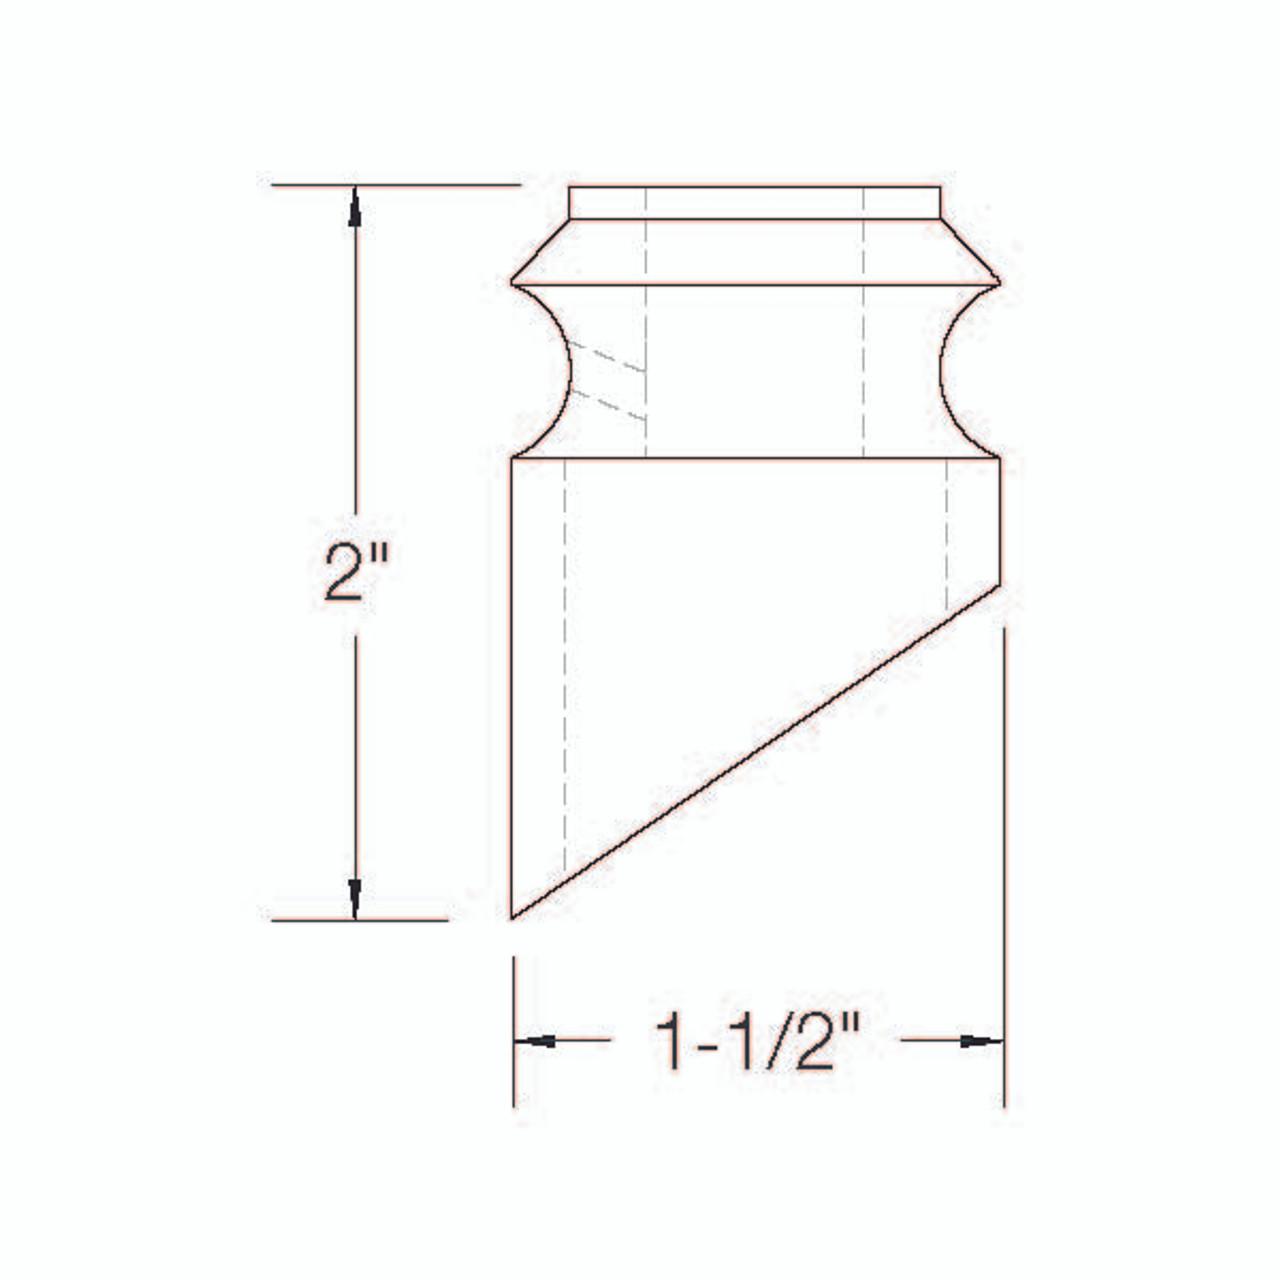 SD504R Slanted Shoe Dimensional Information